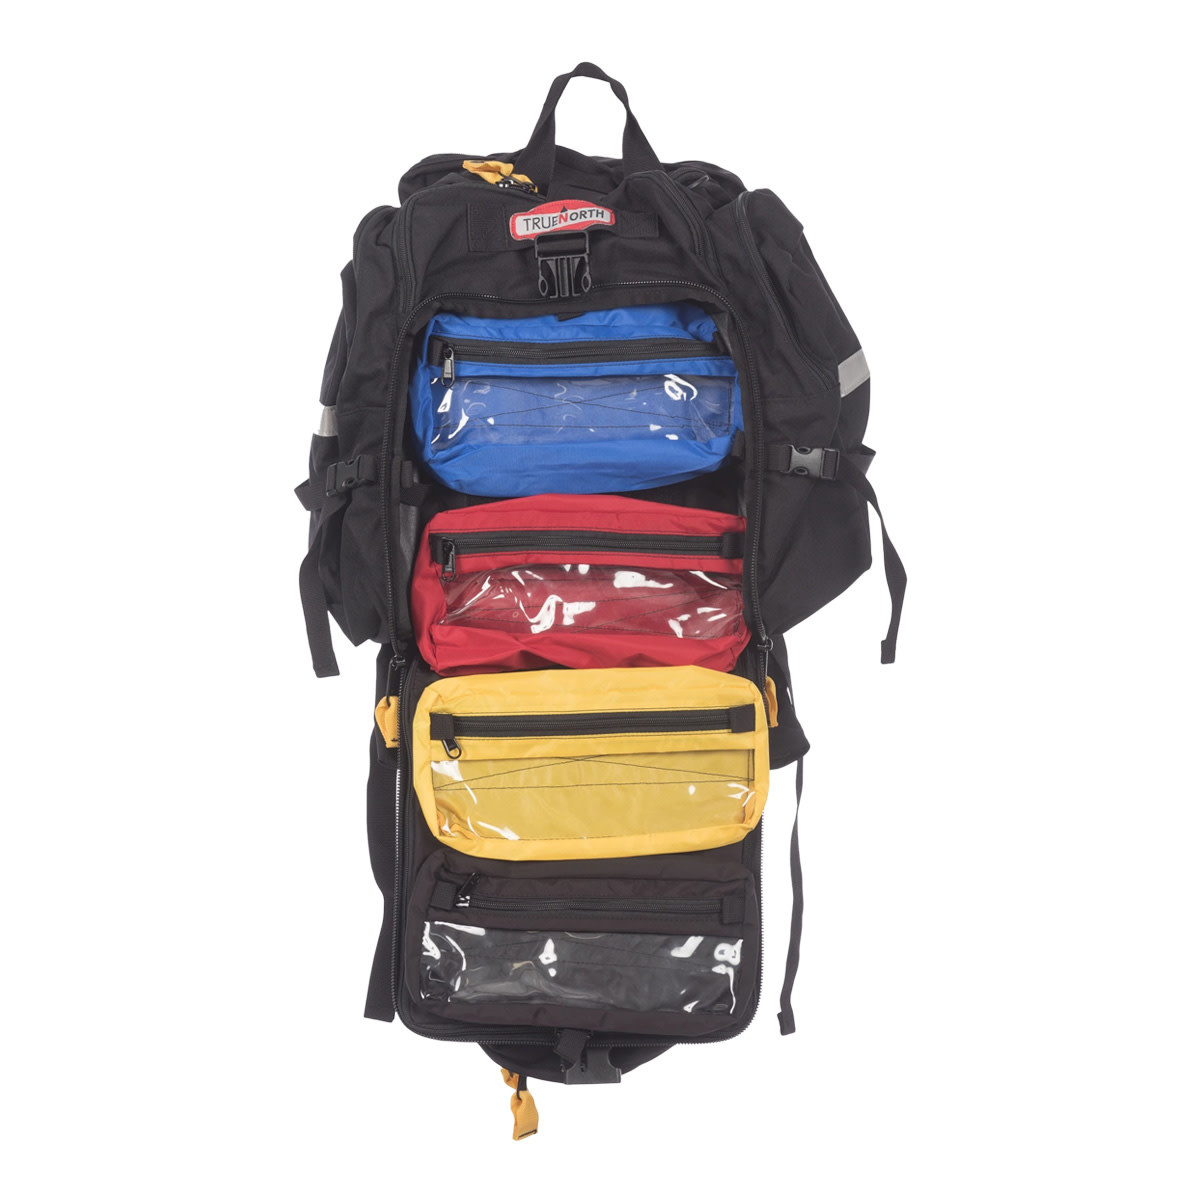 True North Gear True North Gear FRF8400 Firefly™ Medic Gear Bag